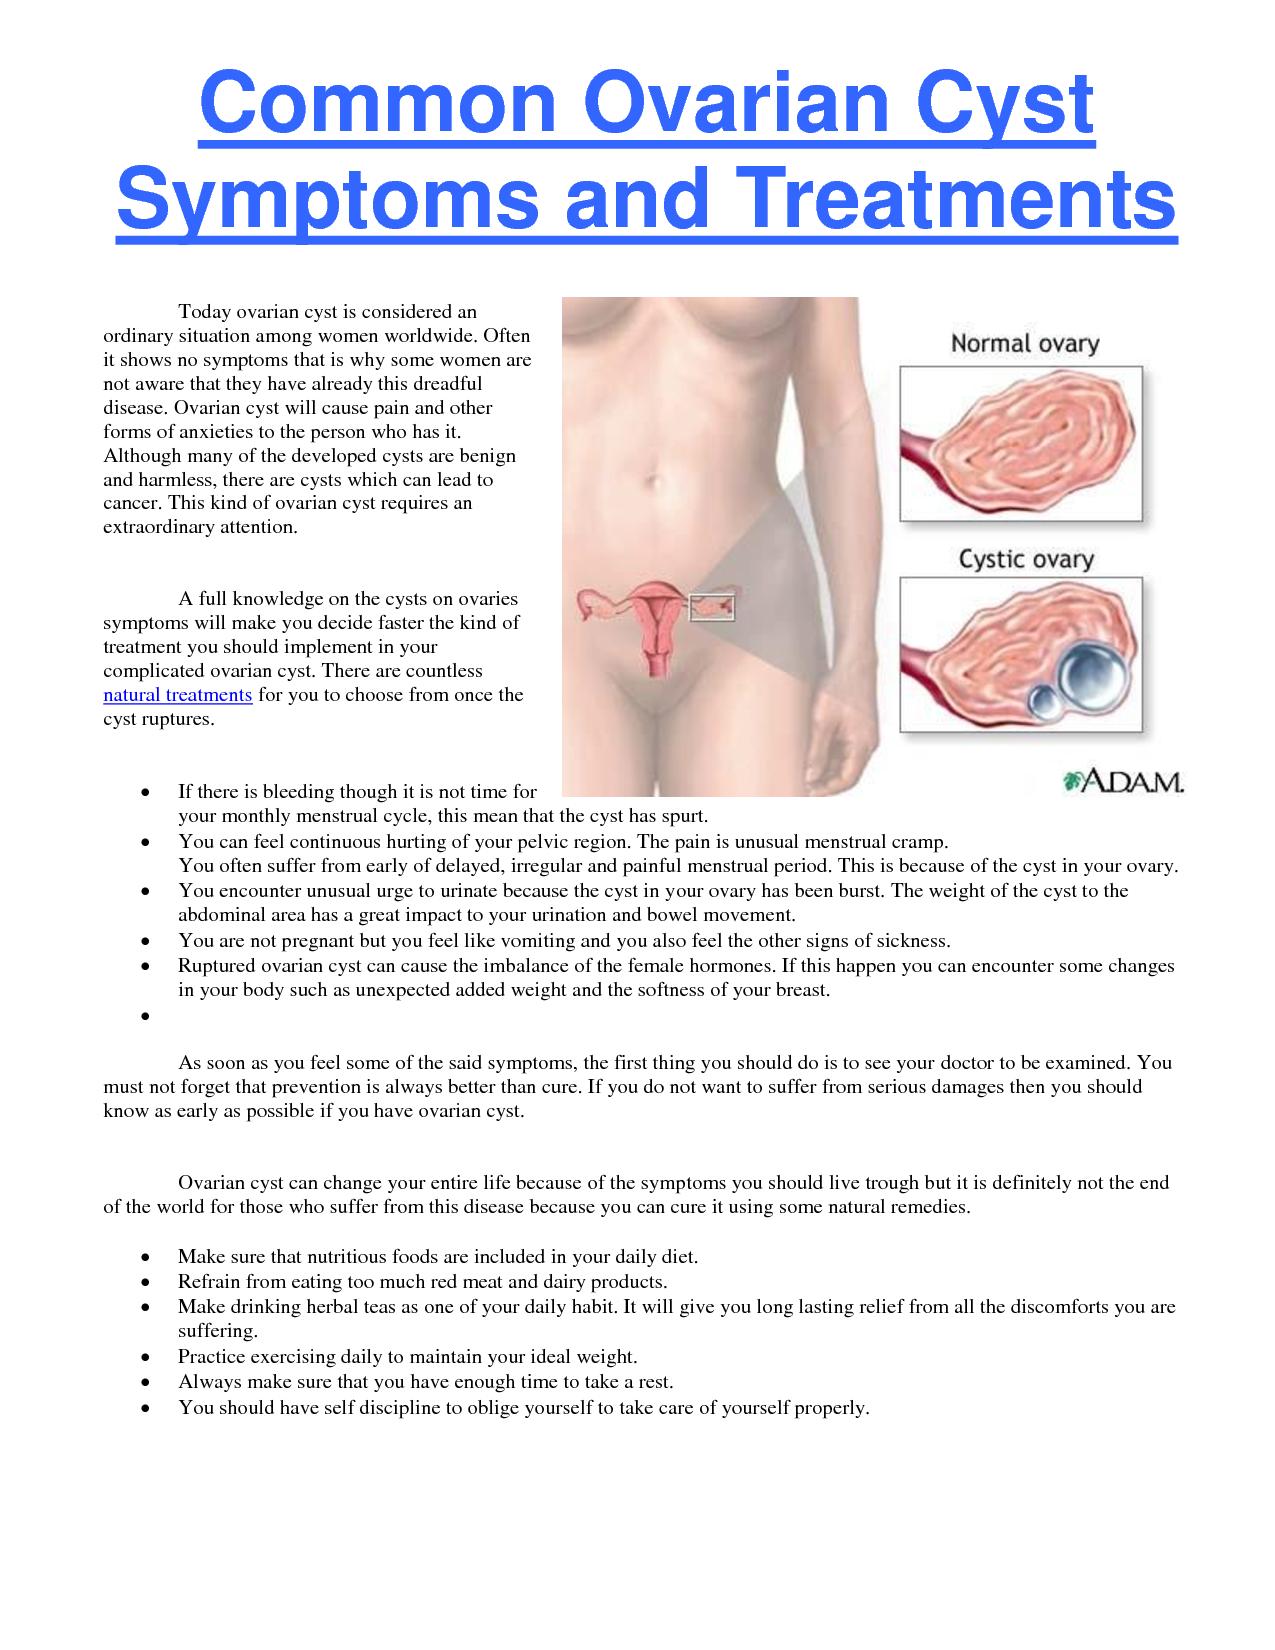 Endometriosis: symptoms and treatment of the disease 55